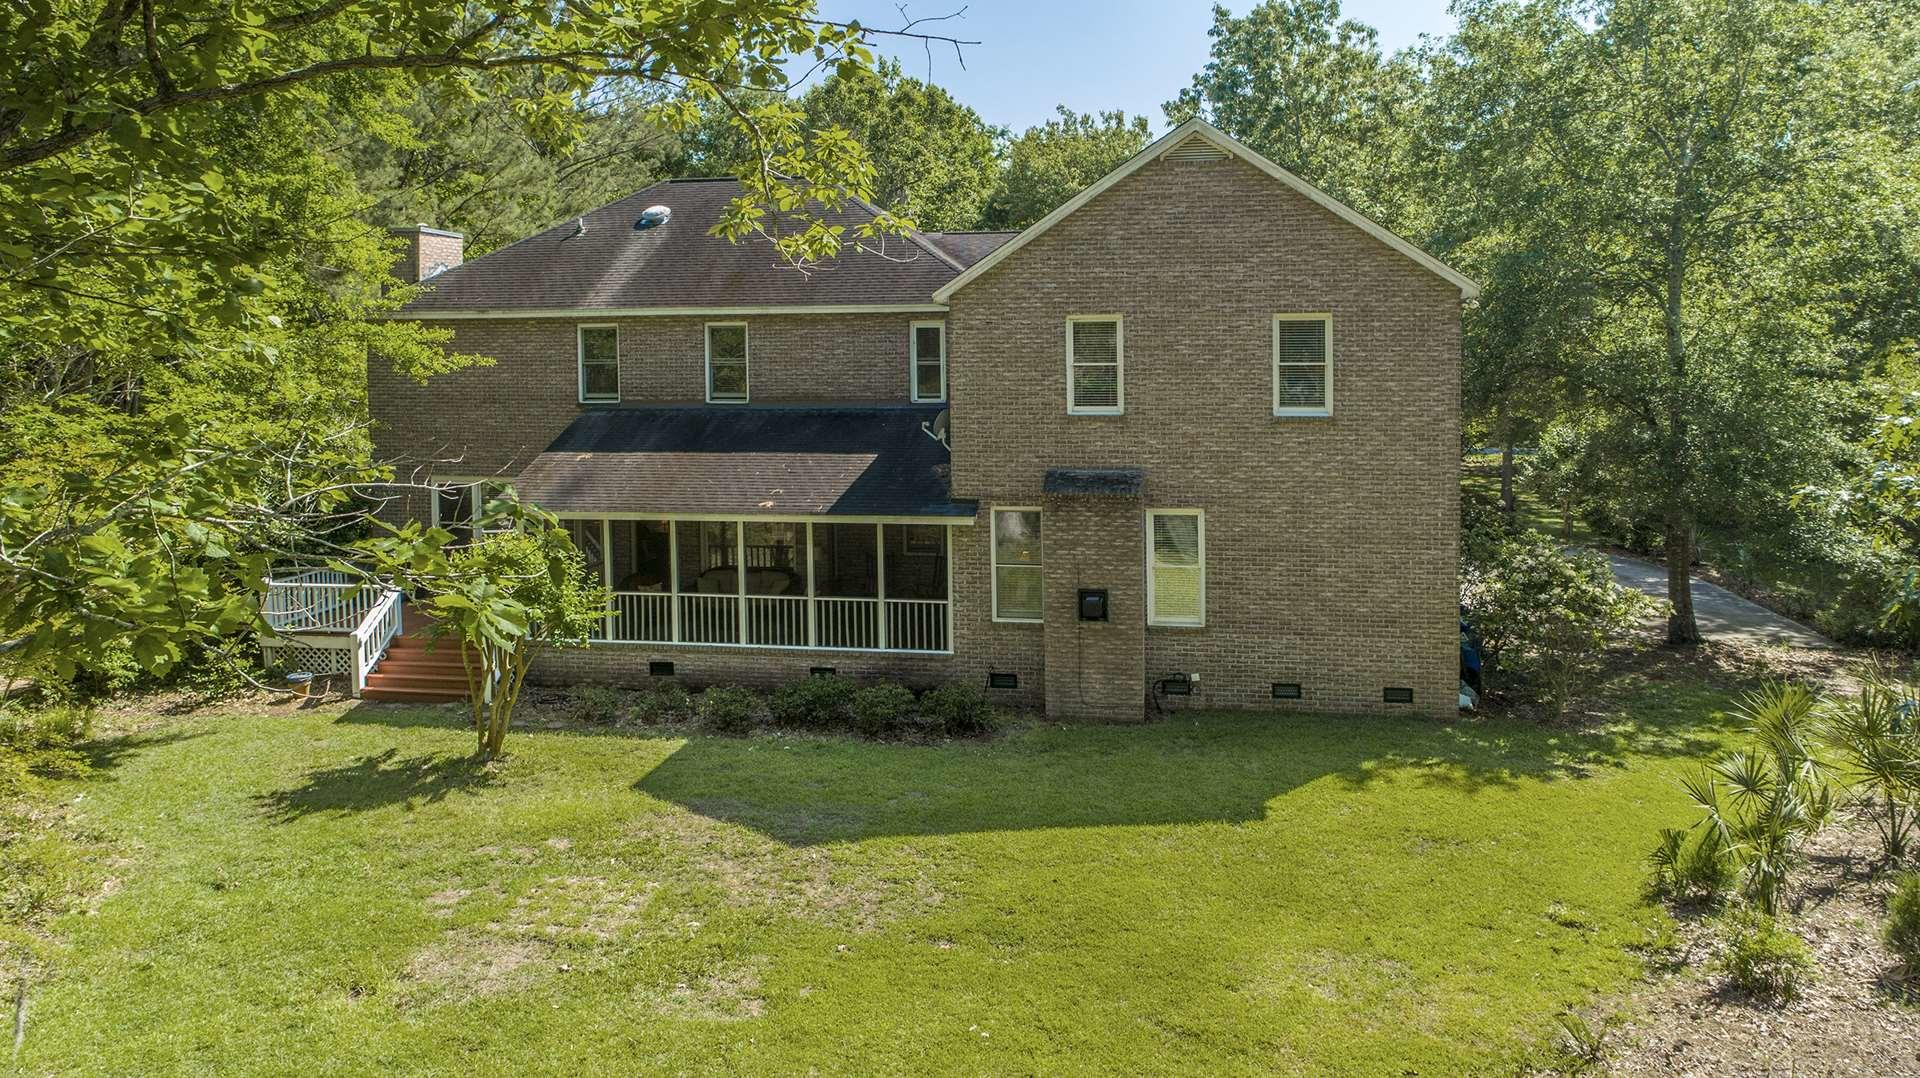 Dunes West Homes For Sale - 2961 Pignatelli, Mount Pleasant, SC - 56